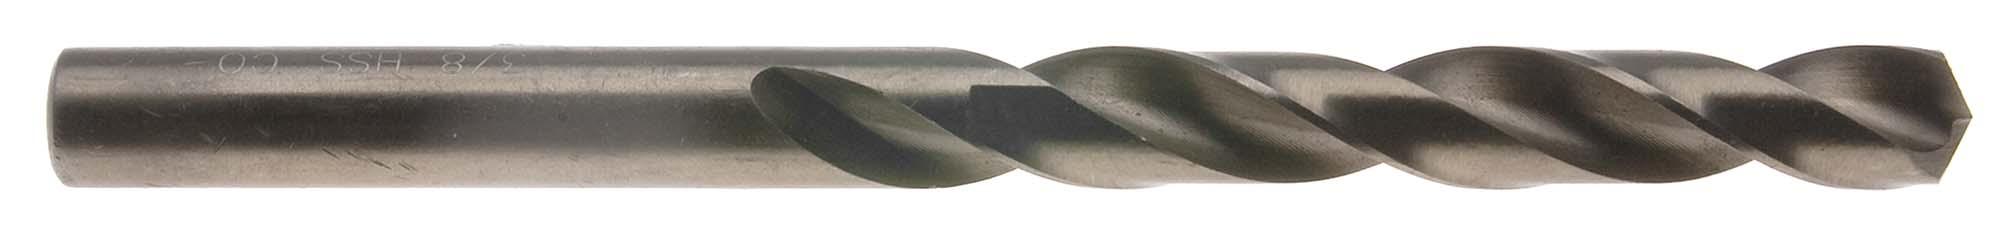 "#38 (.1015"") Cobalt Jobber Length Drill Bit"